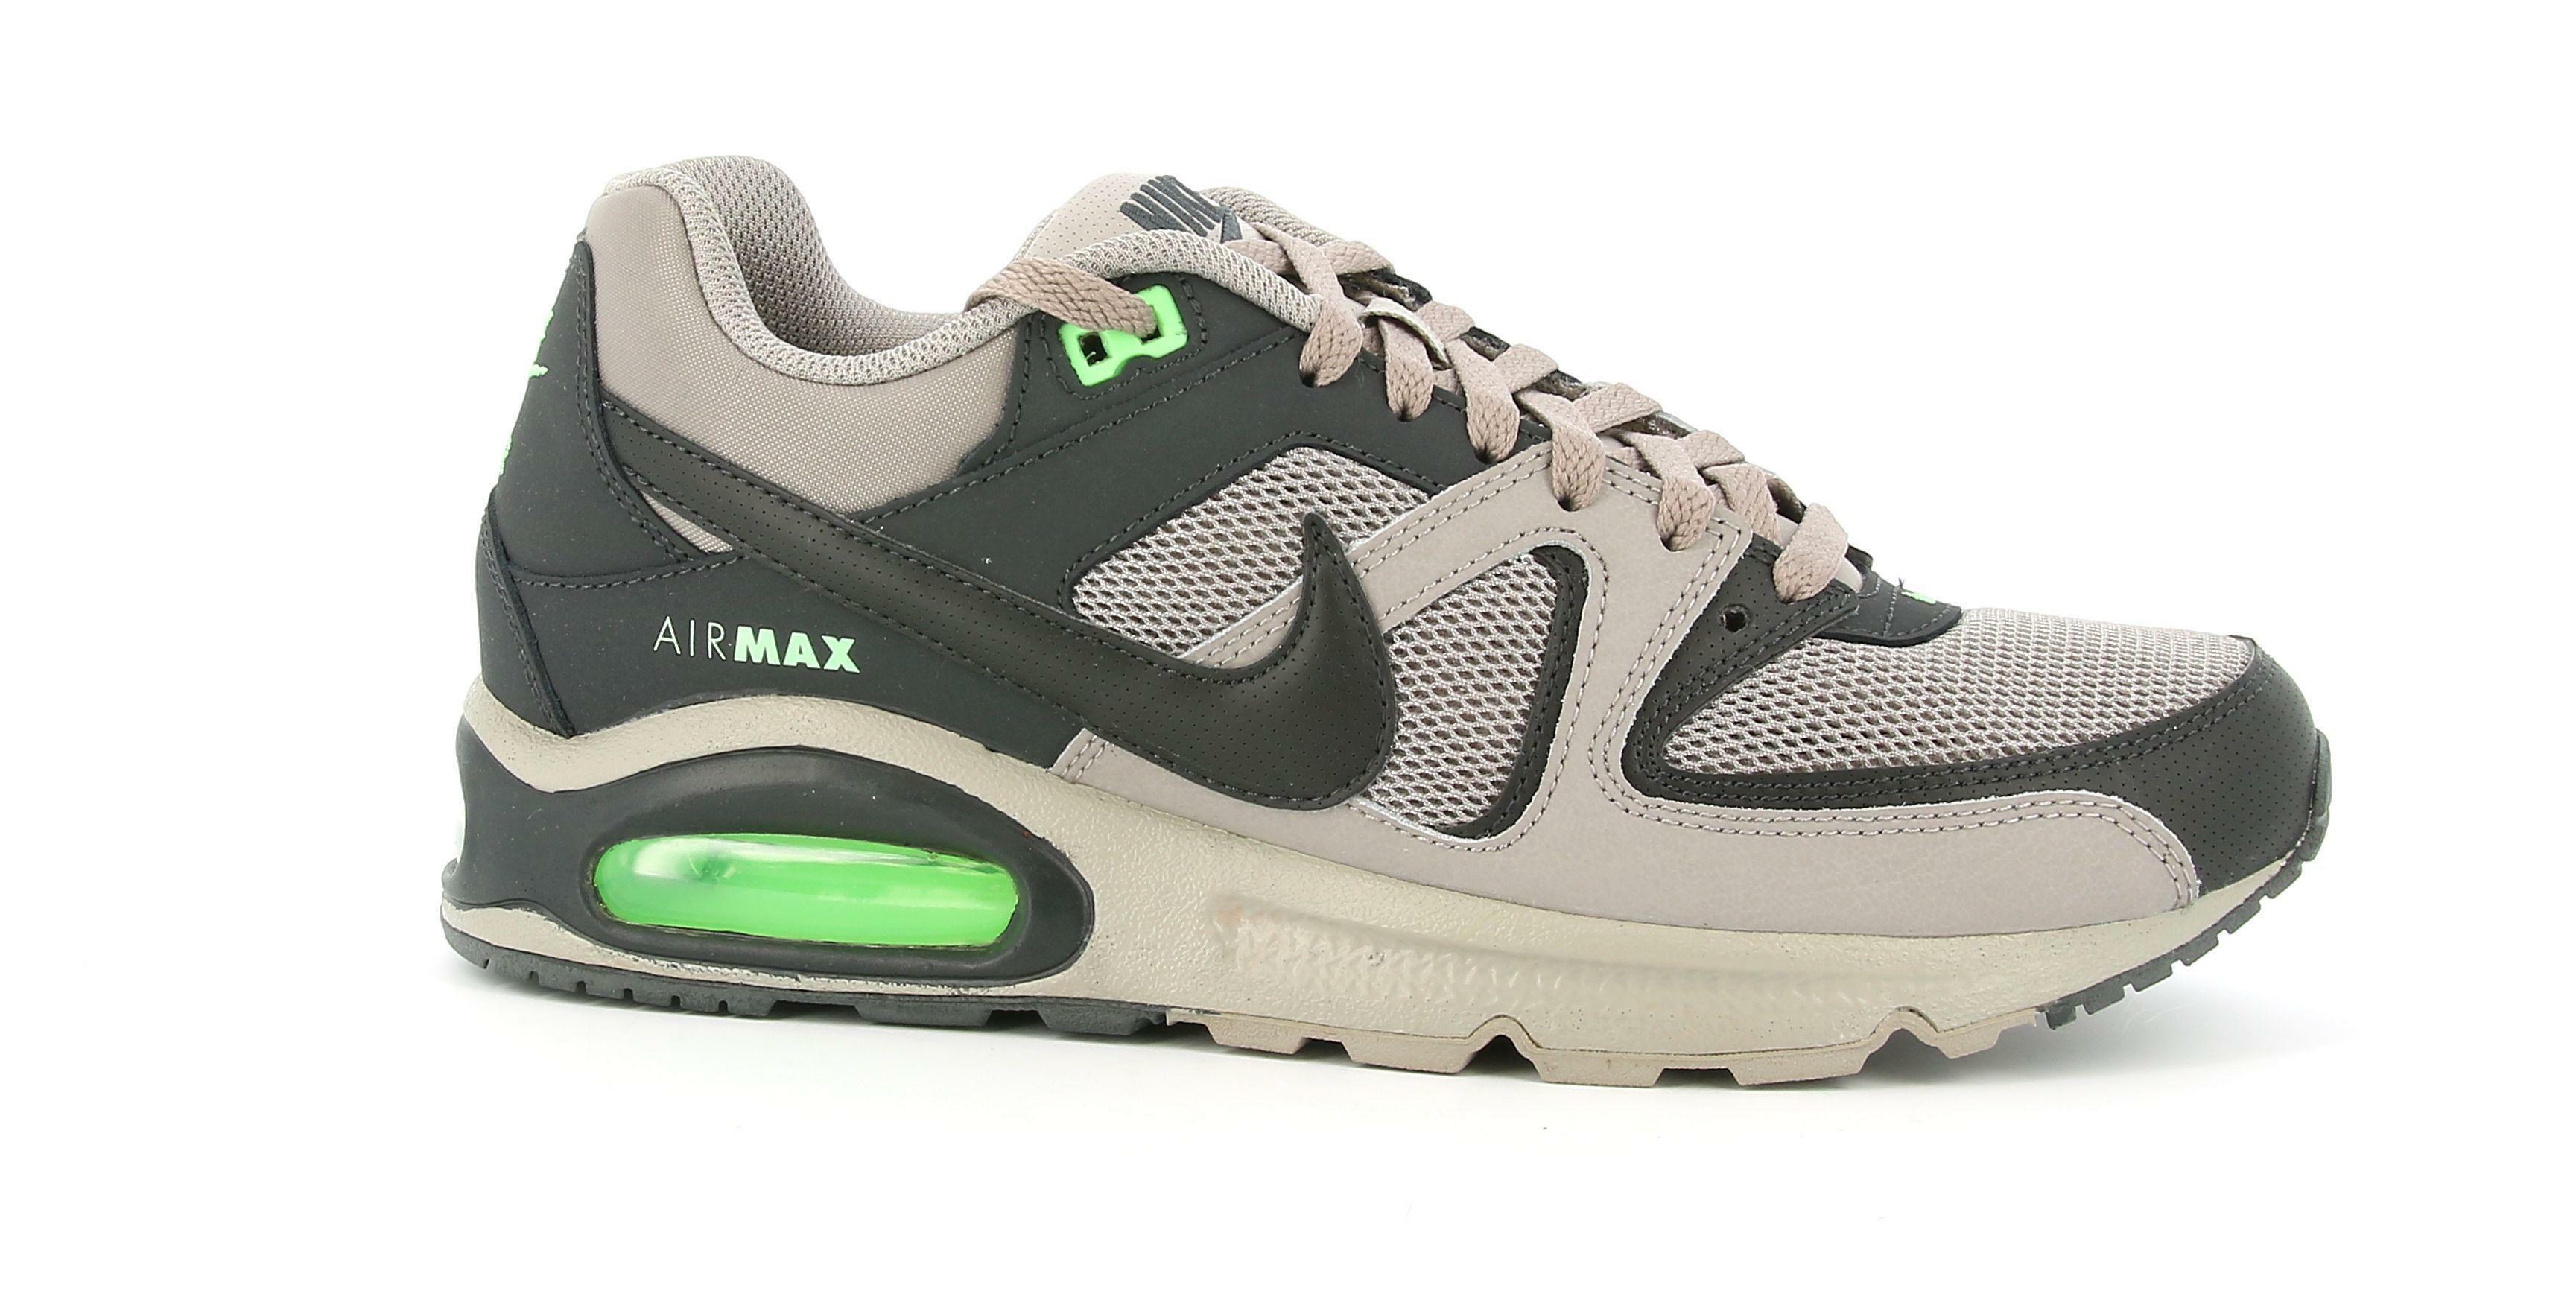 nike nike air max command scarpe da corsa uomo ct1286 001